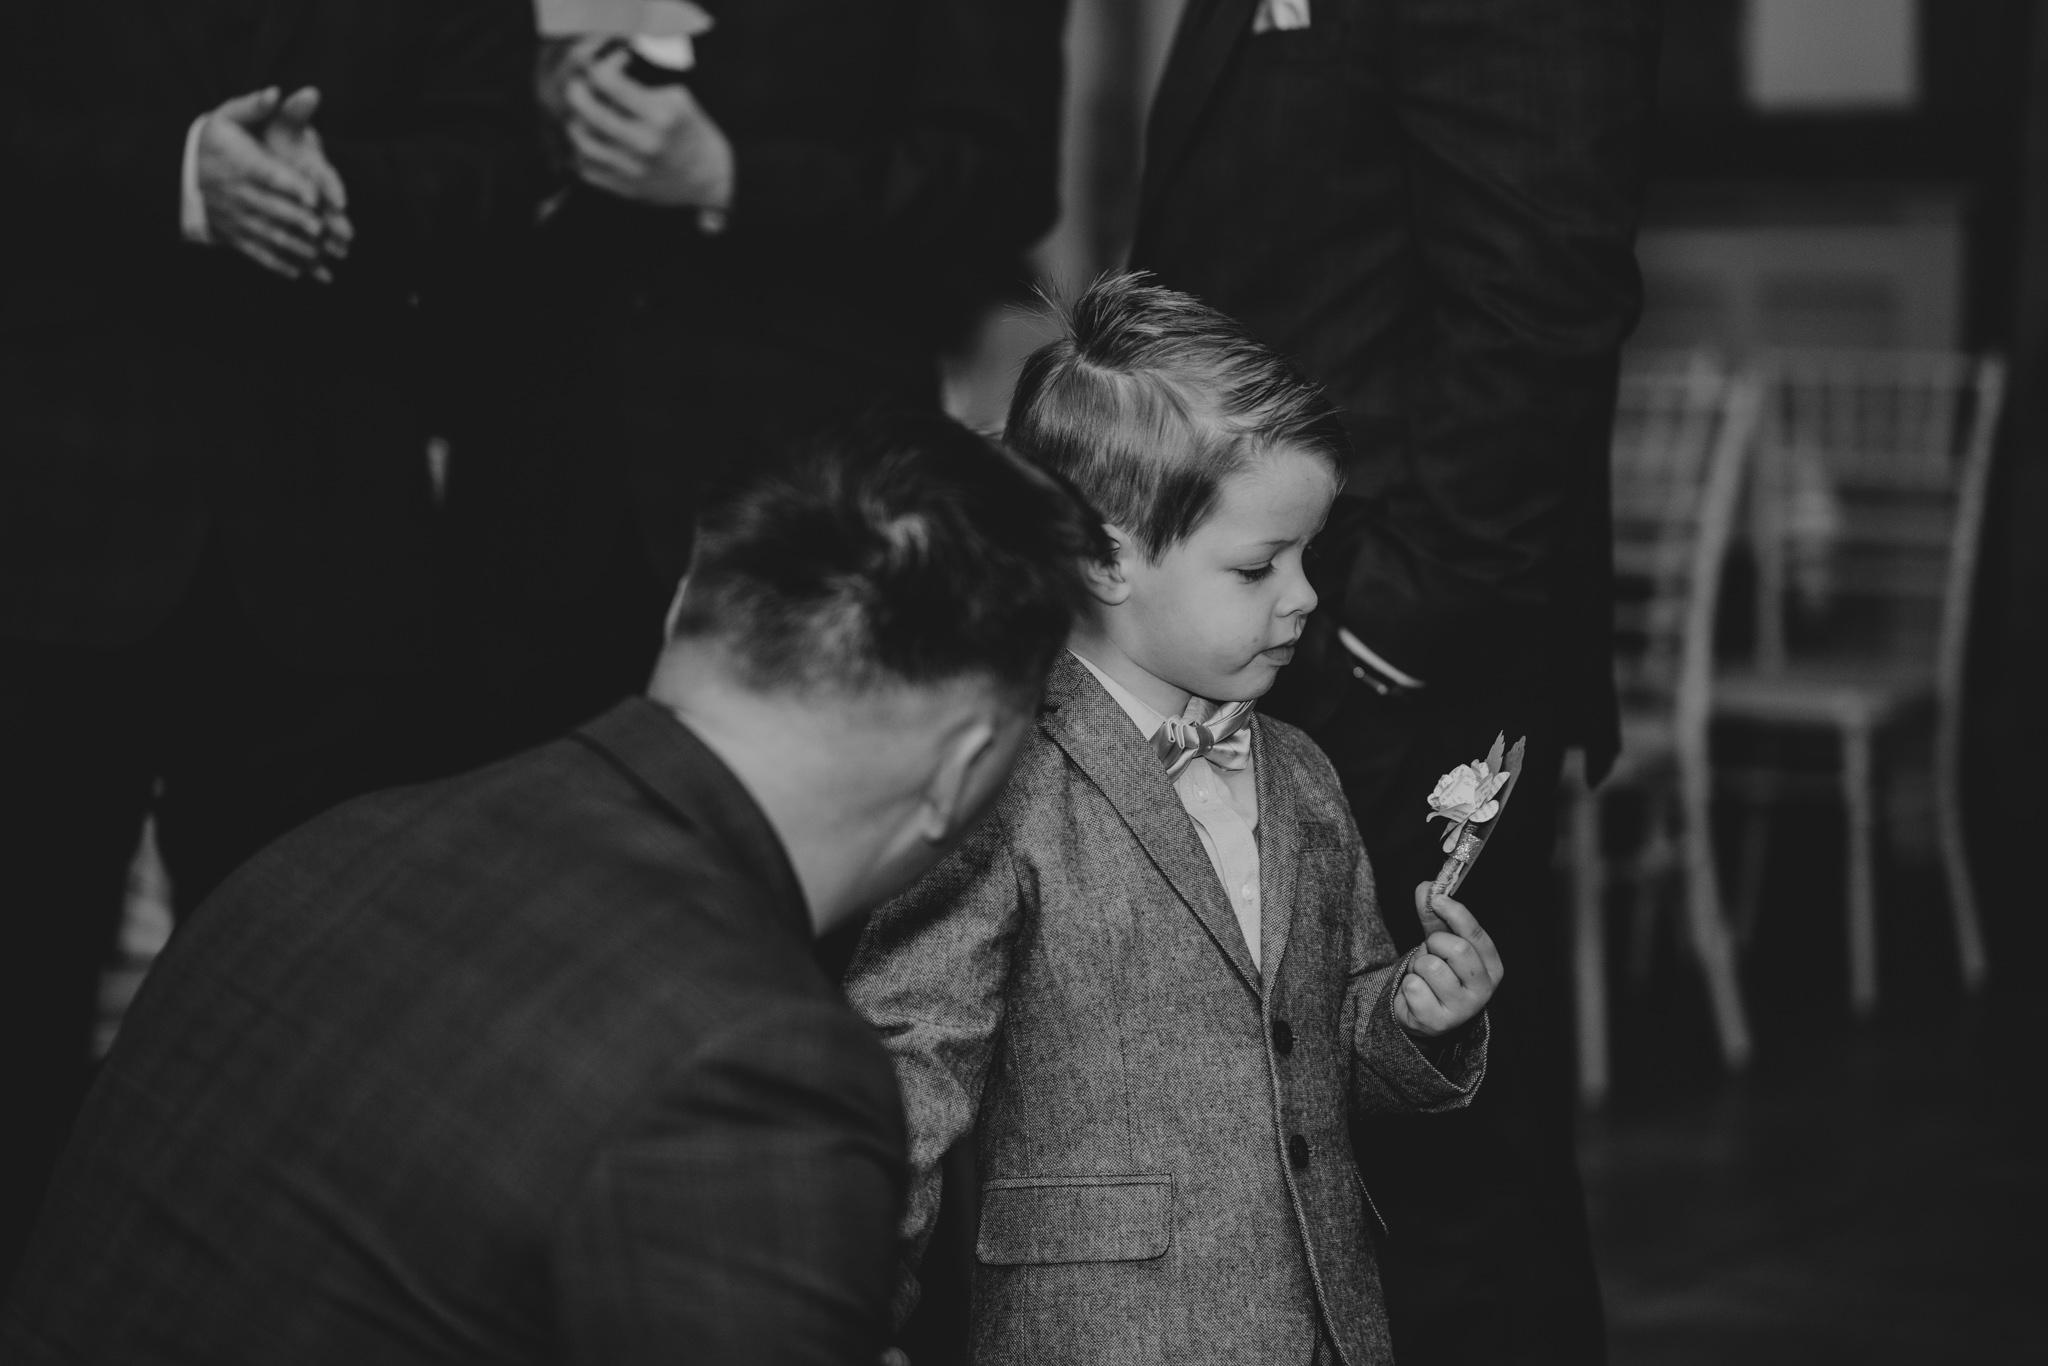 rhia-james-rustic-crabbs-barn-vintage-50s-retro-wedding-grace-elizabeth-colchester-essex-alternative-relaxed-wedding-family-photography-devon-suffolk-norfolk-essex (62 of 138).jpg